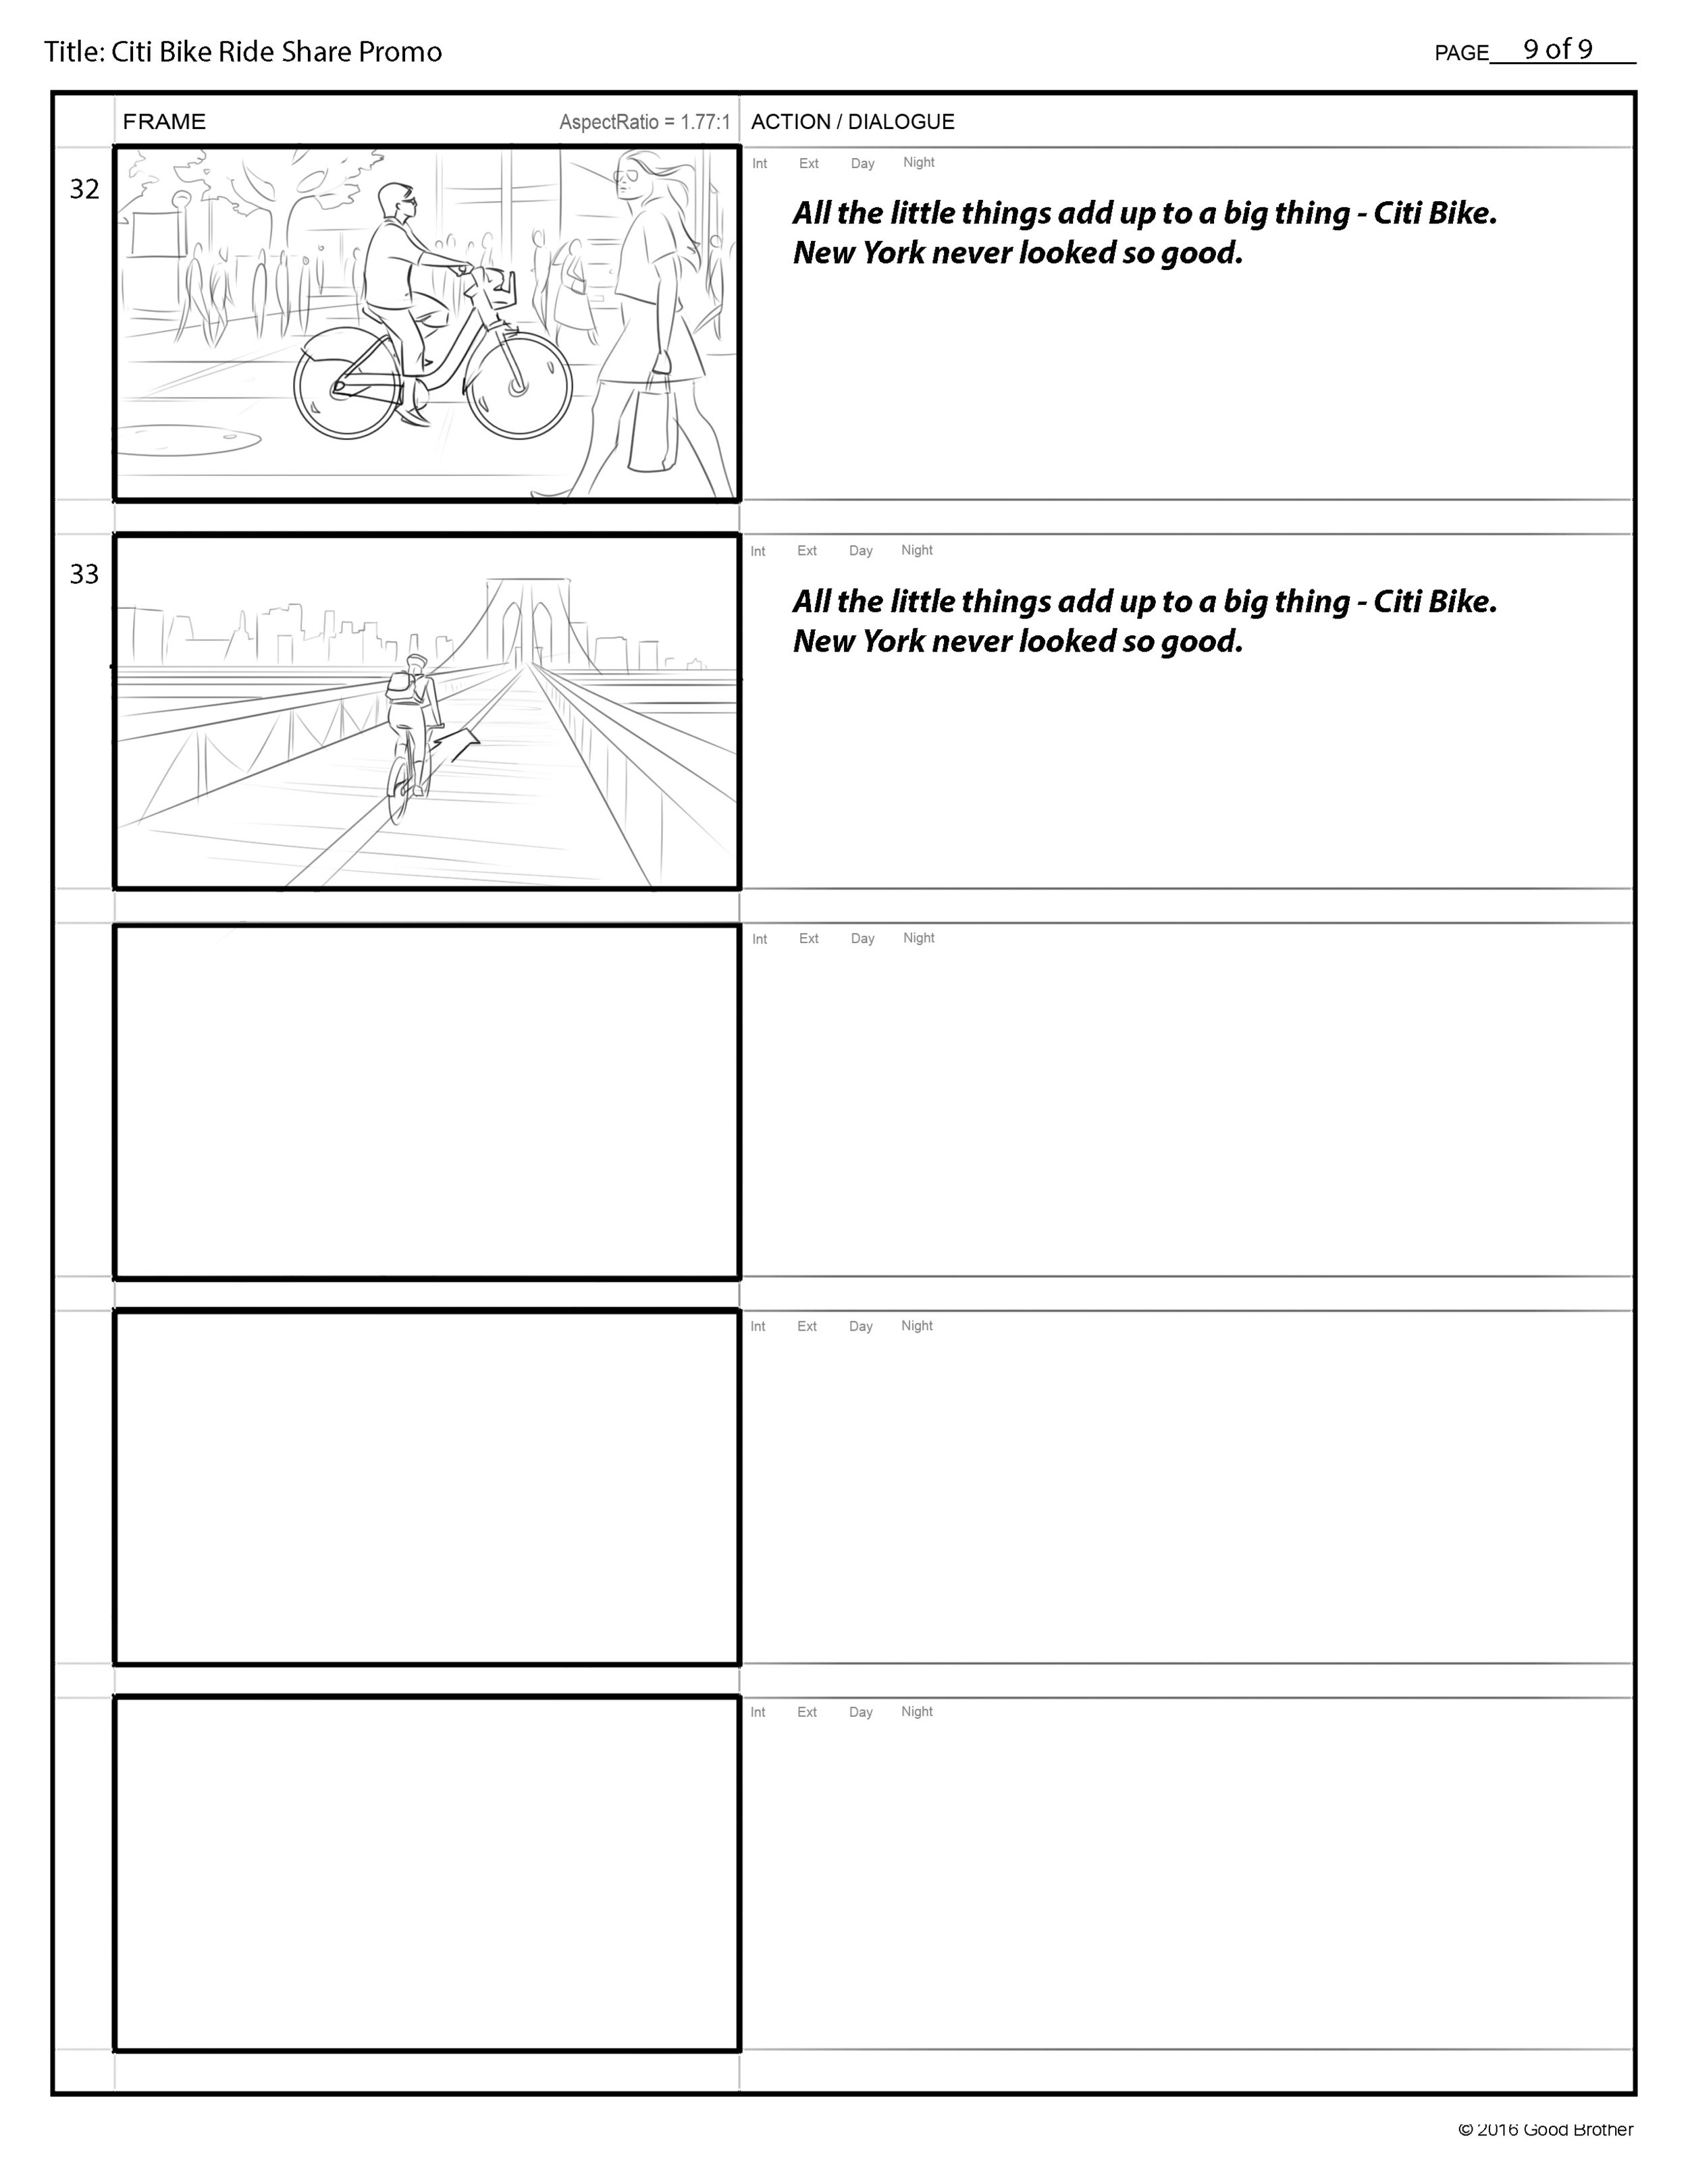 Citi Bike Storyboard FINAL_Page_9.jpg